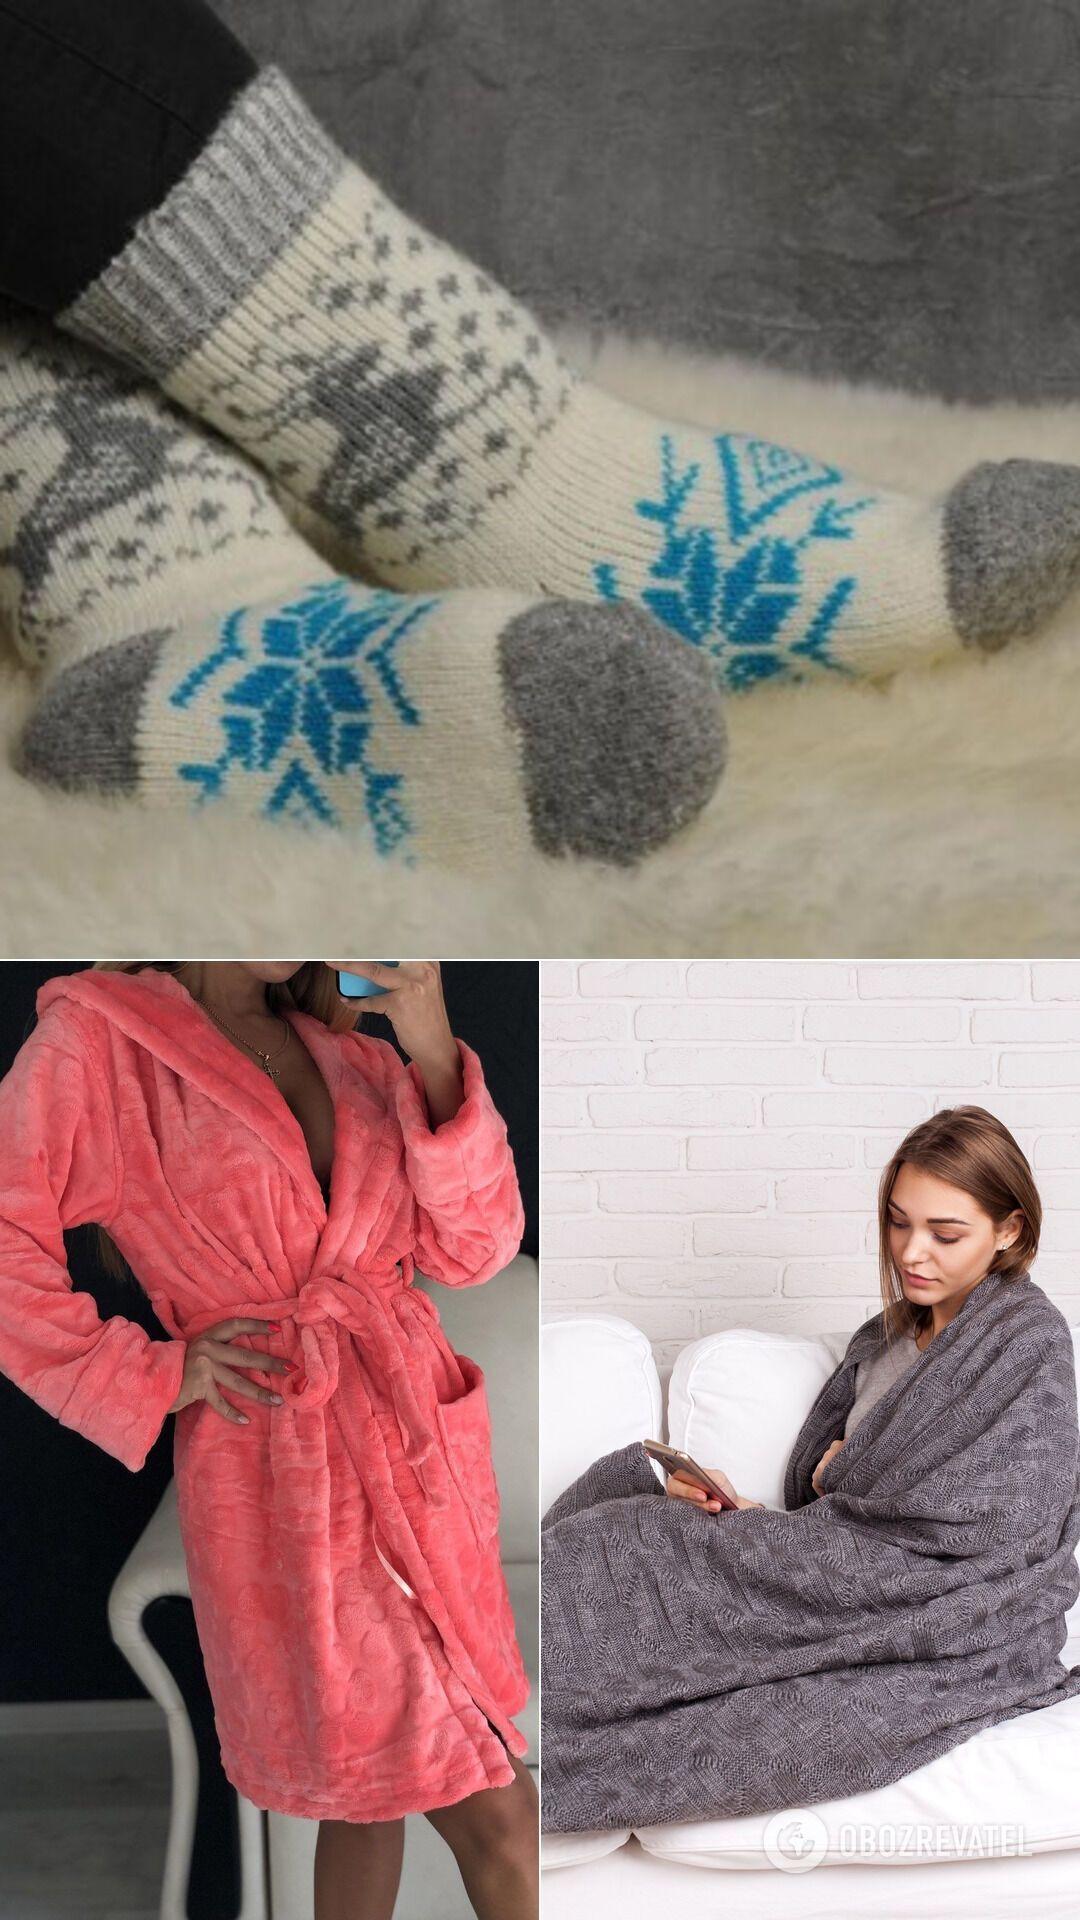 Тепла ковдра, халат або шкарпетки